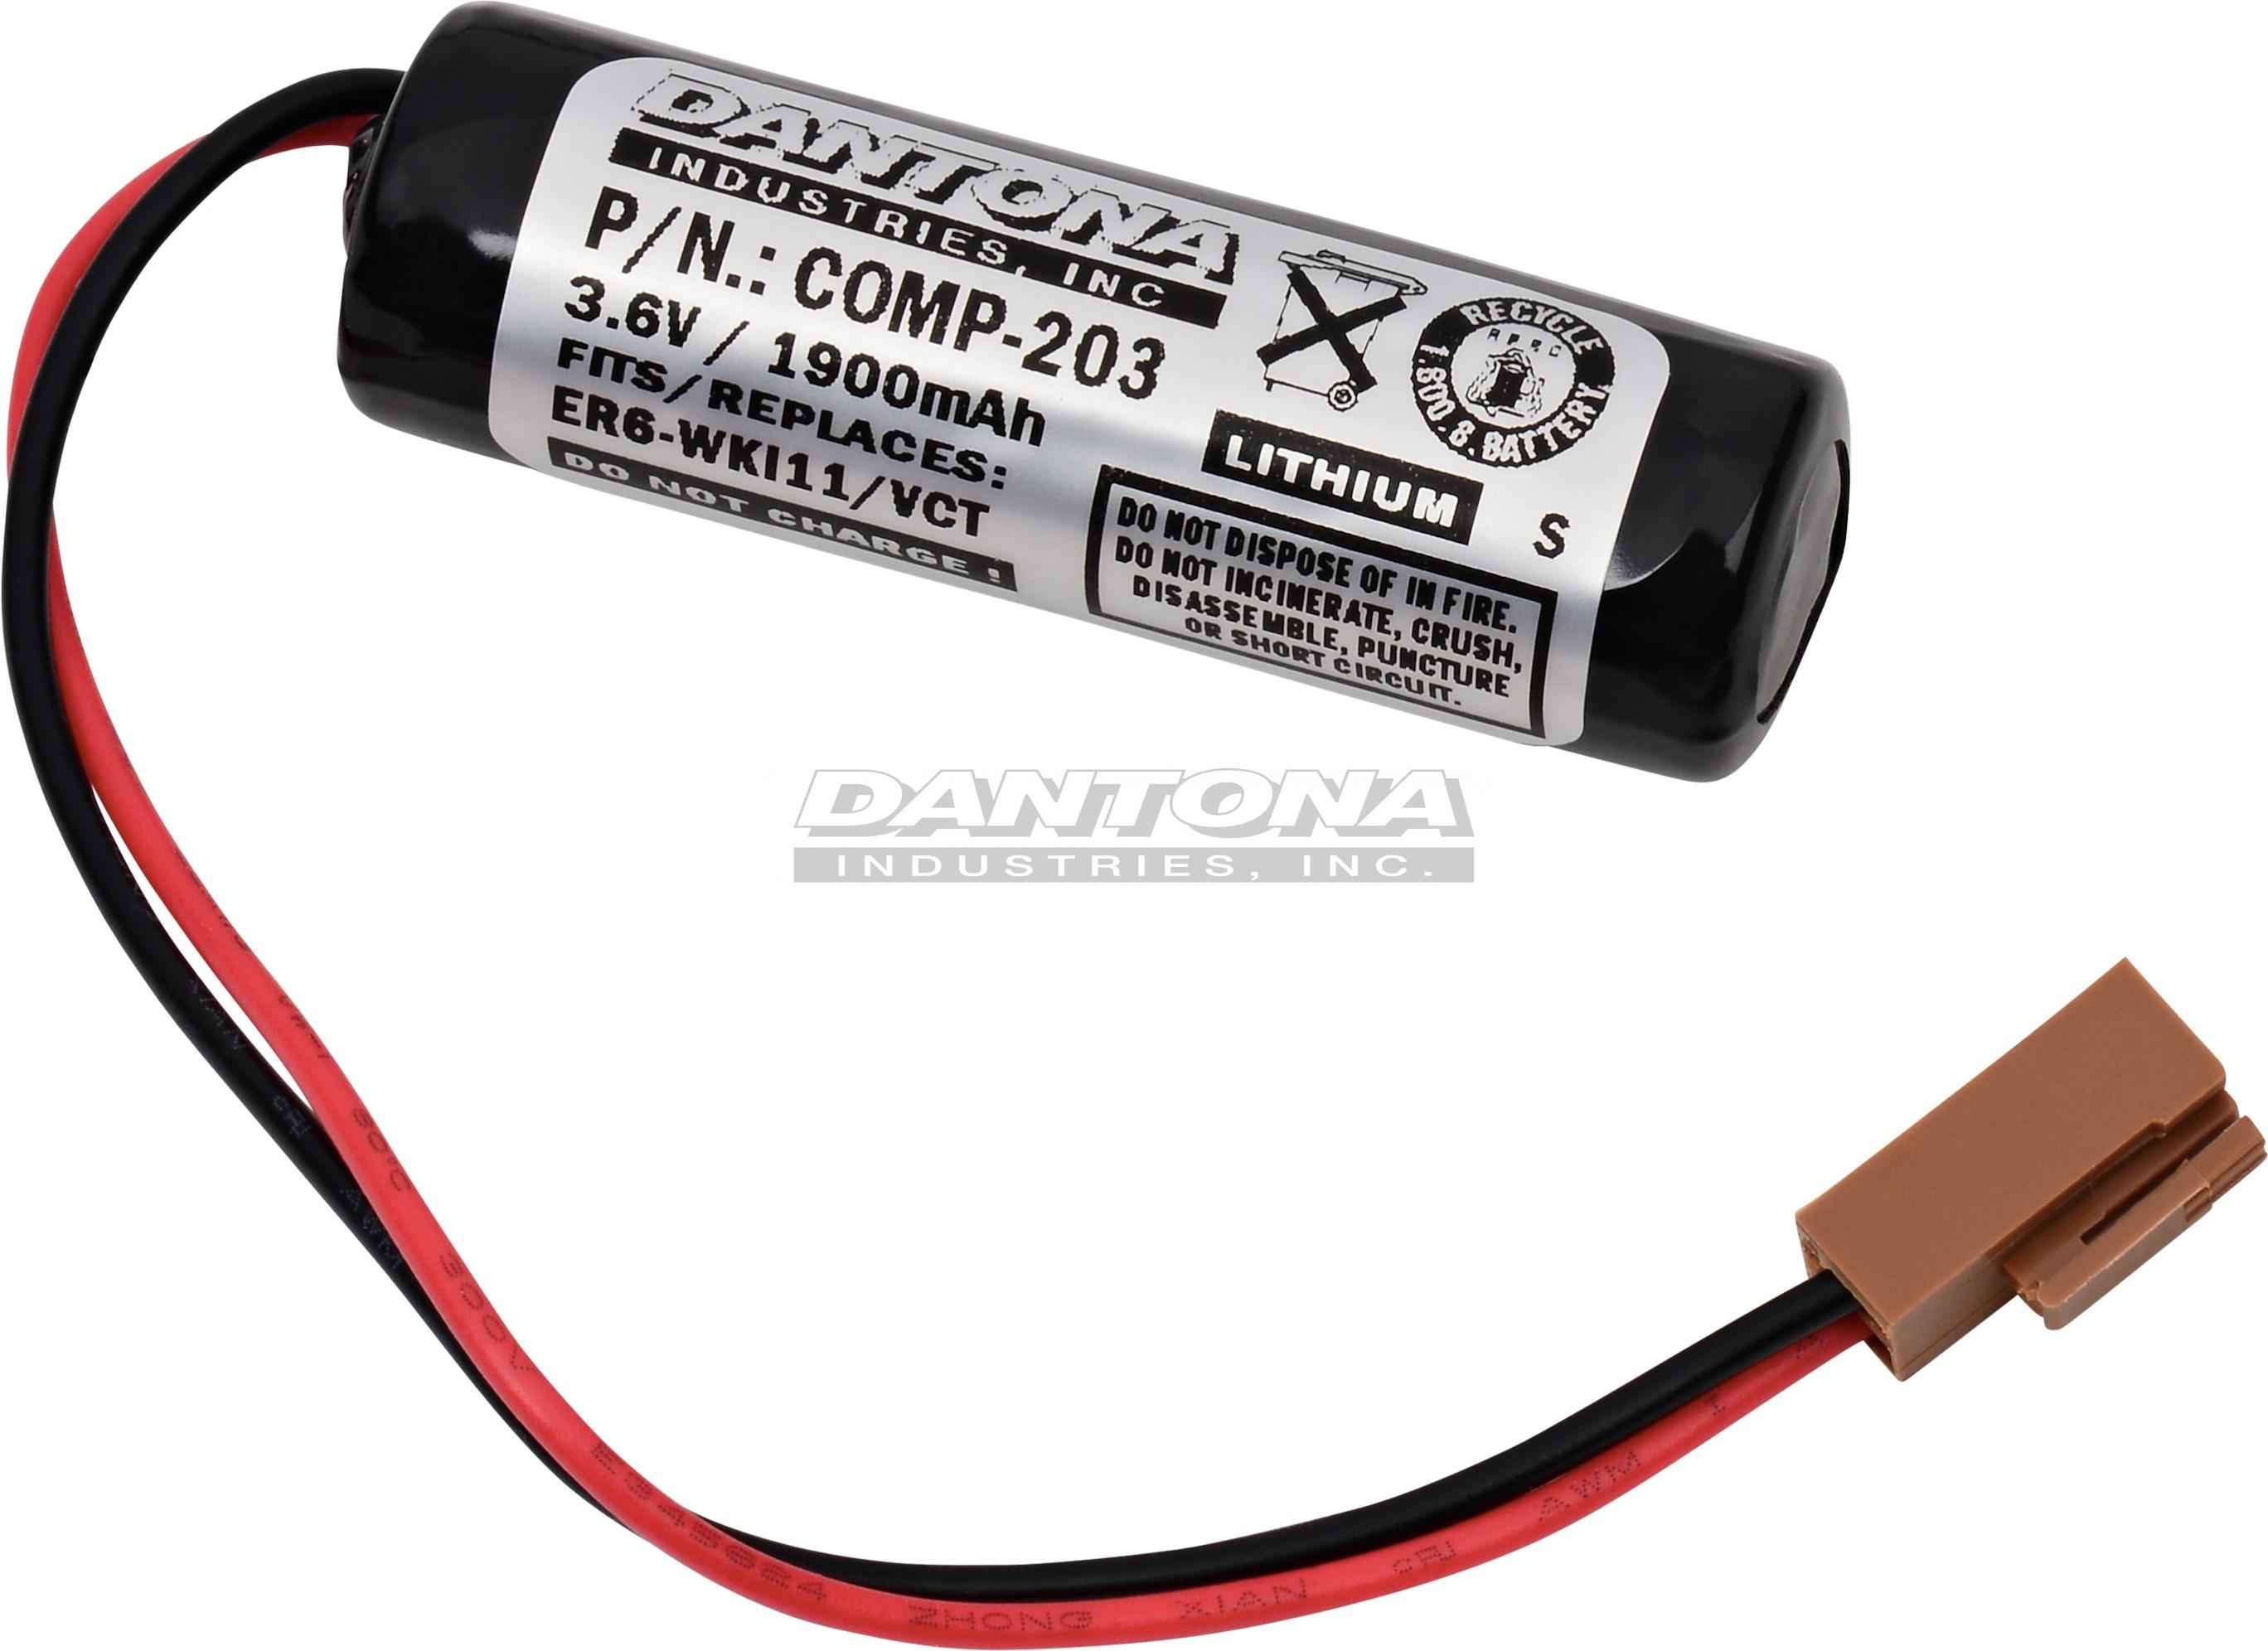 COMP-203